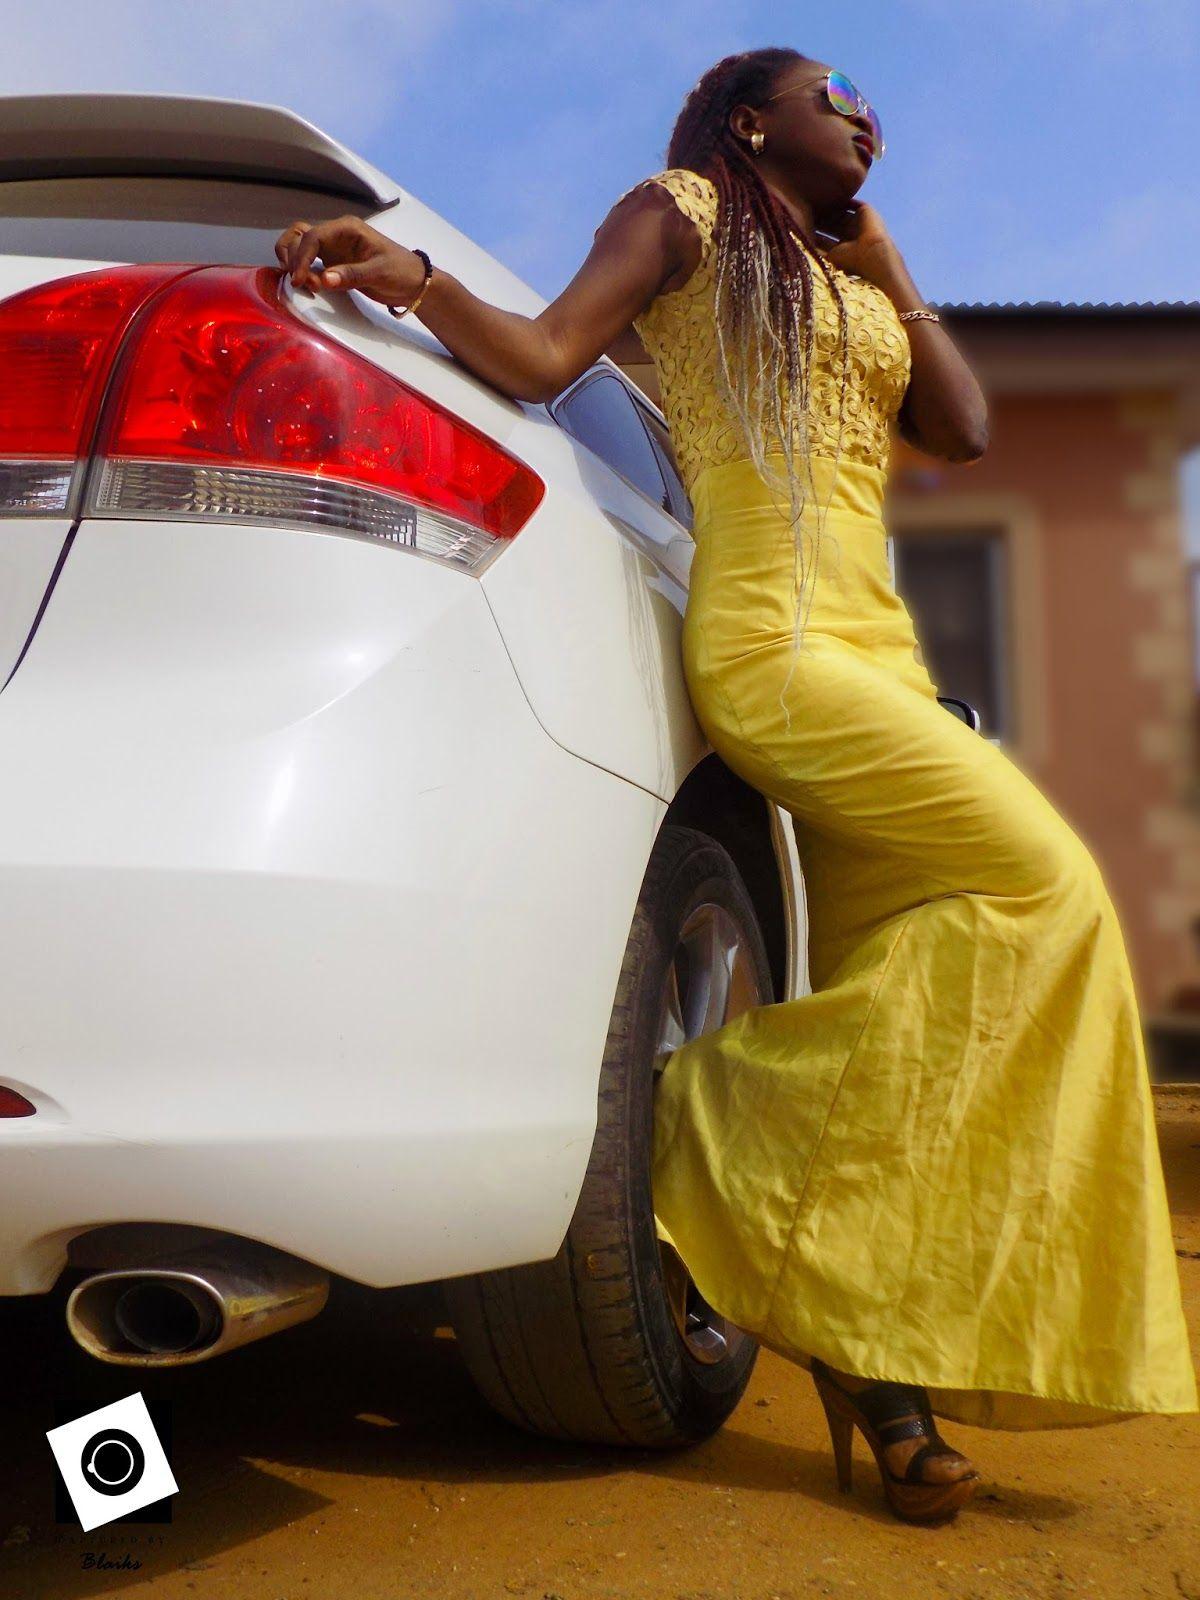 Latest African Fashion, African women dresses, African Prints, African clothing jackets, skirts, short dresses, African men's fashion, children's fashion, African bags, African shoes African fashion, Ankara, kitenge, African women dresses, African prints, African men's fashion, Nigerian style, Ghanaian fashion  #Africanfashion #AfricanWeddings #Africanprints #Ethnicprints #Africanwomen #africanTradition #AfricanArt #AfricanStyle #AfricanBeads #Gele #Kente #Ankara #Nigerianfashion…